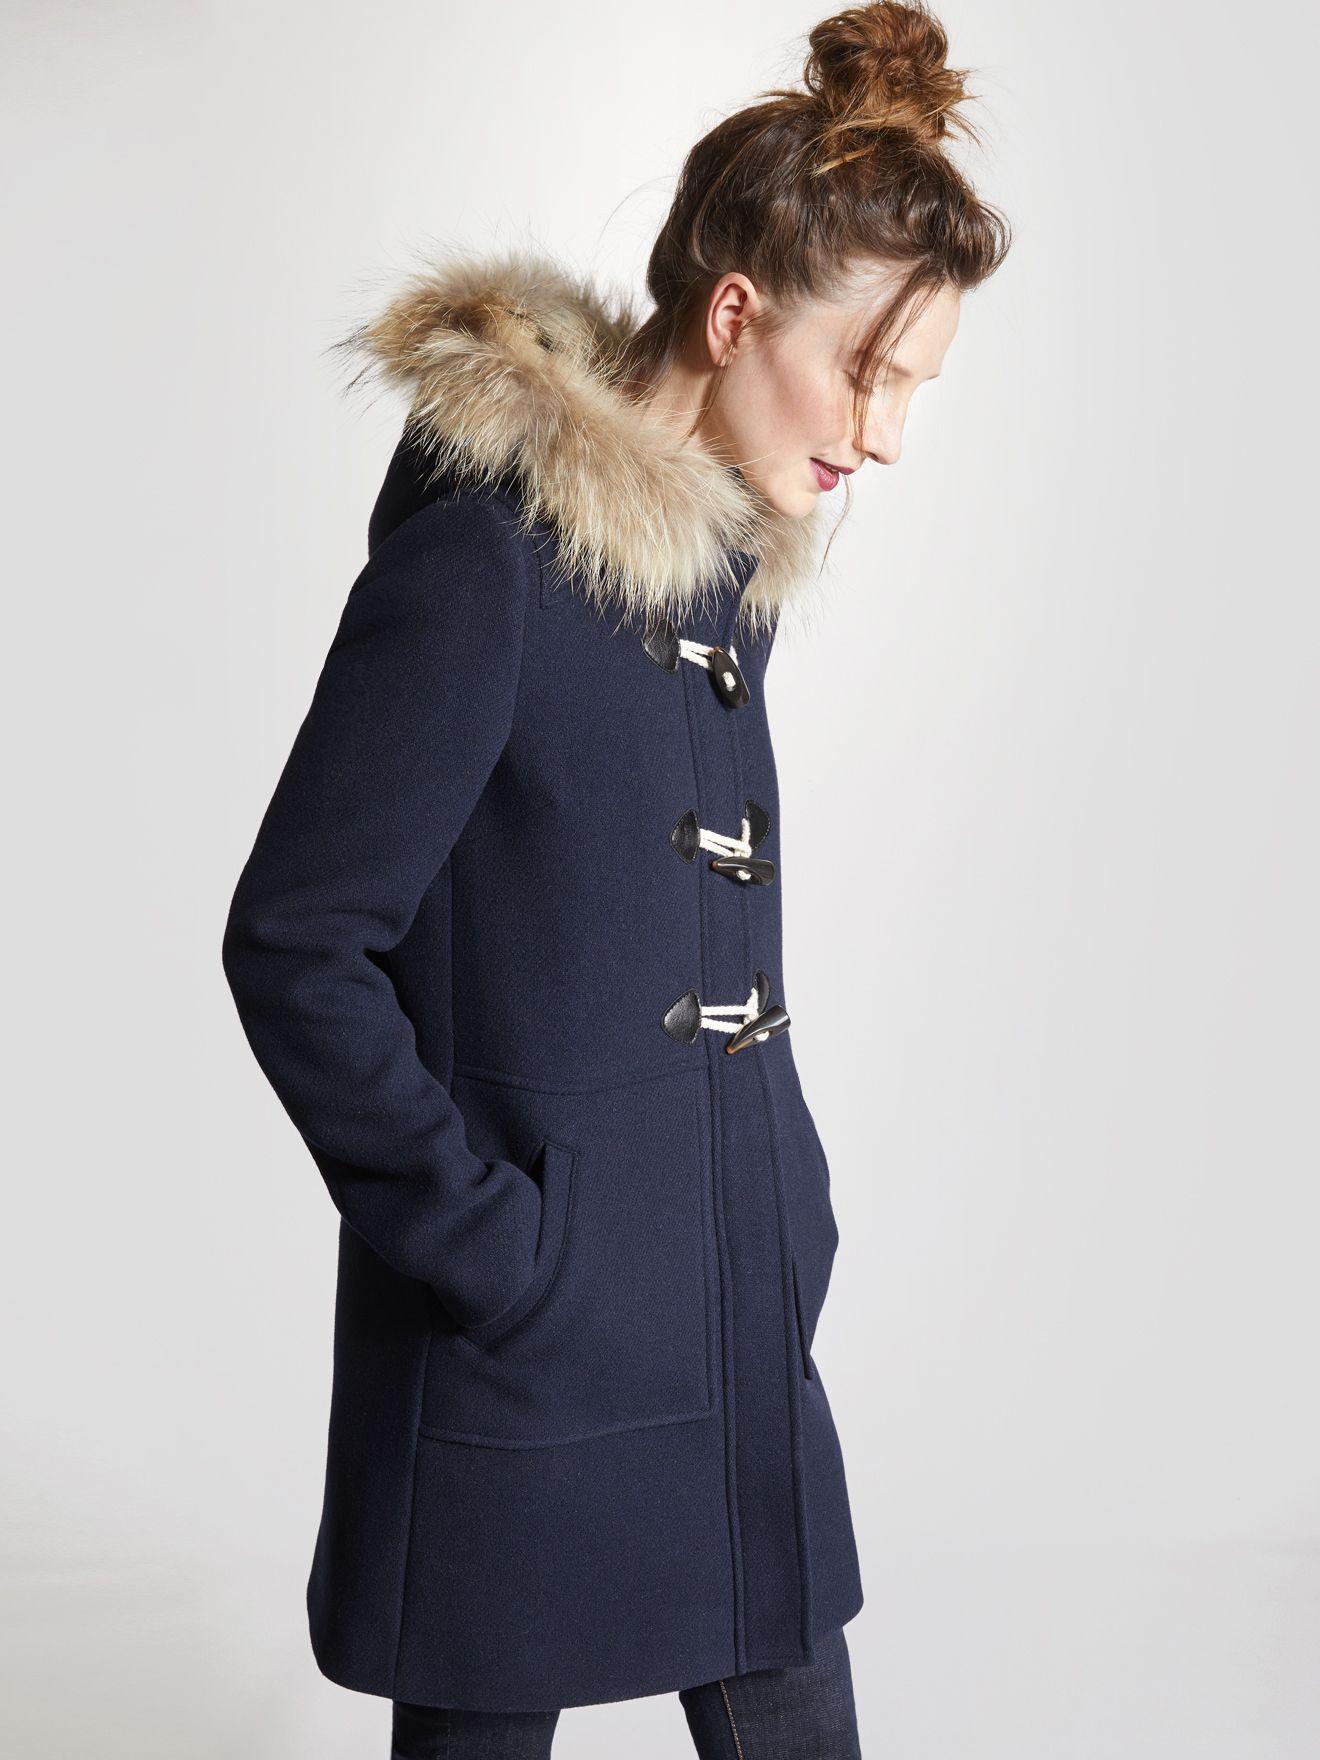 Duffle coat femme | Manteaux | Duffle coat femme, Cuir femme